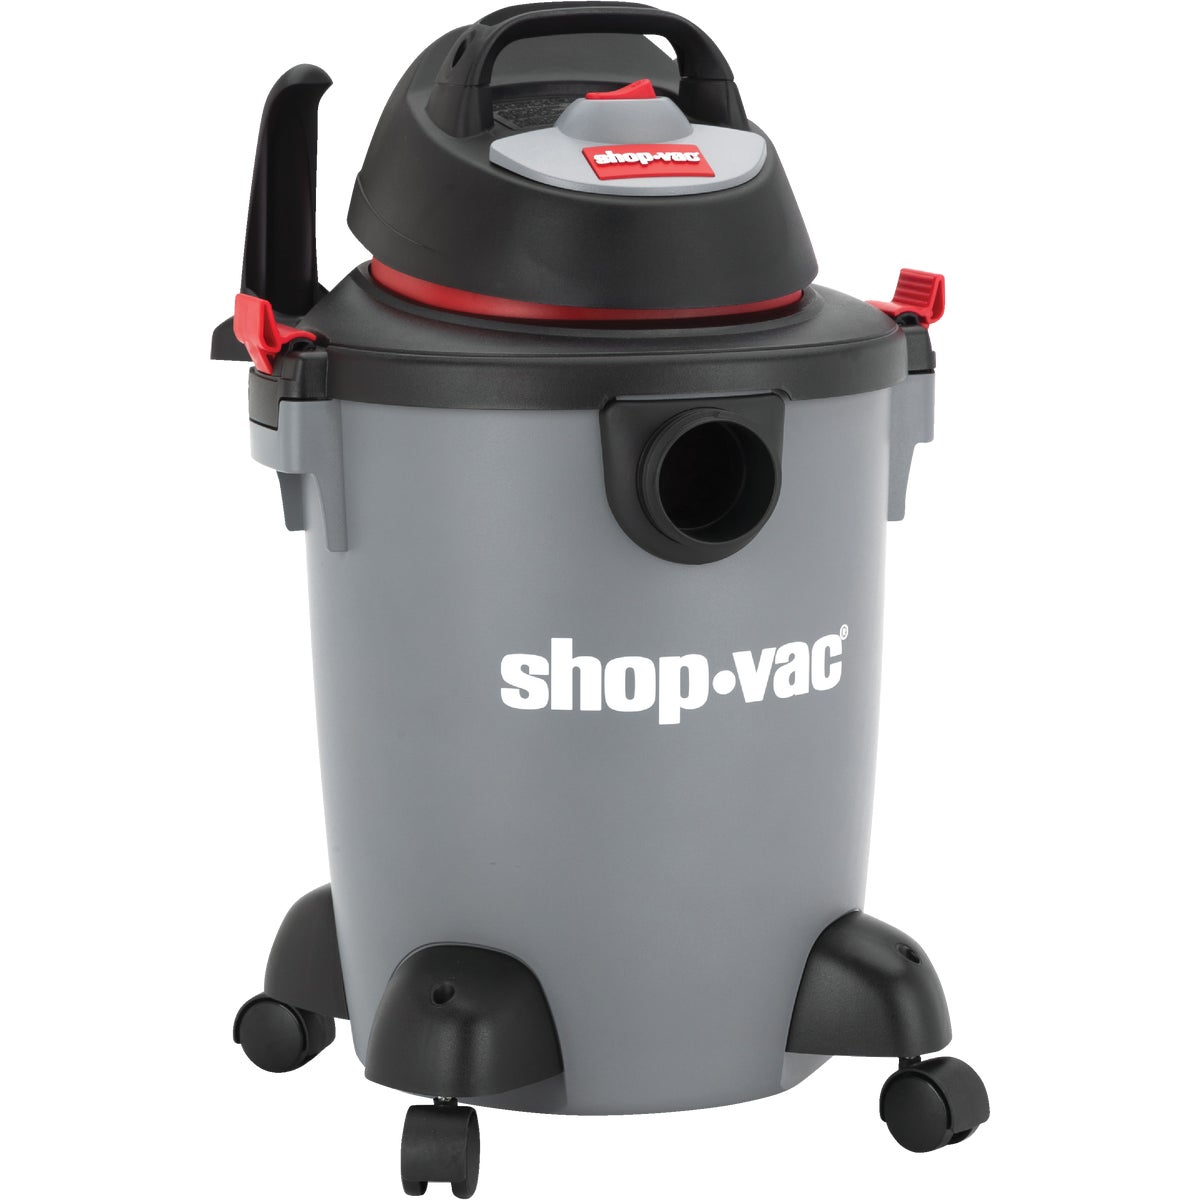 6GAL WET/DRY VAC - 9650600 by Shop Vac Corp